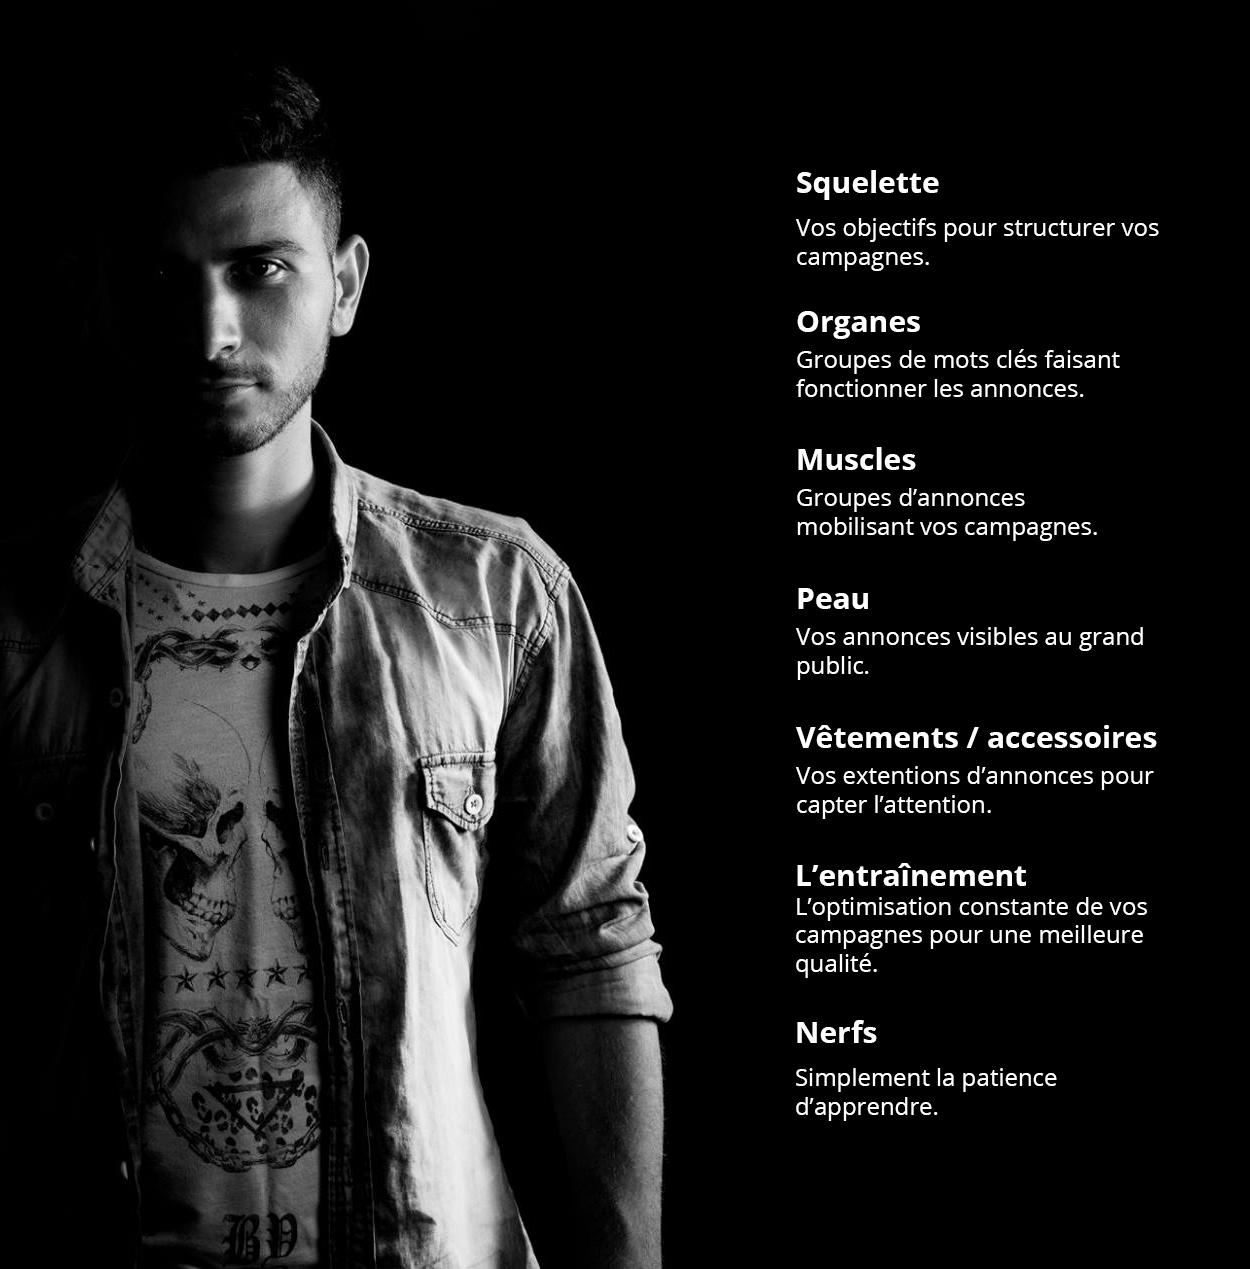 anatomie d'une campagne AdWords